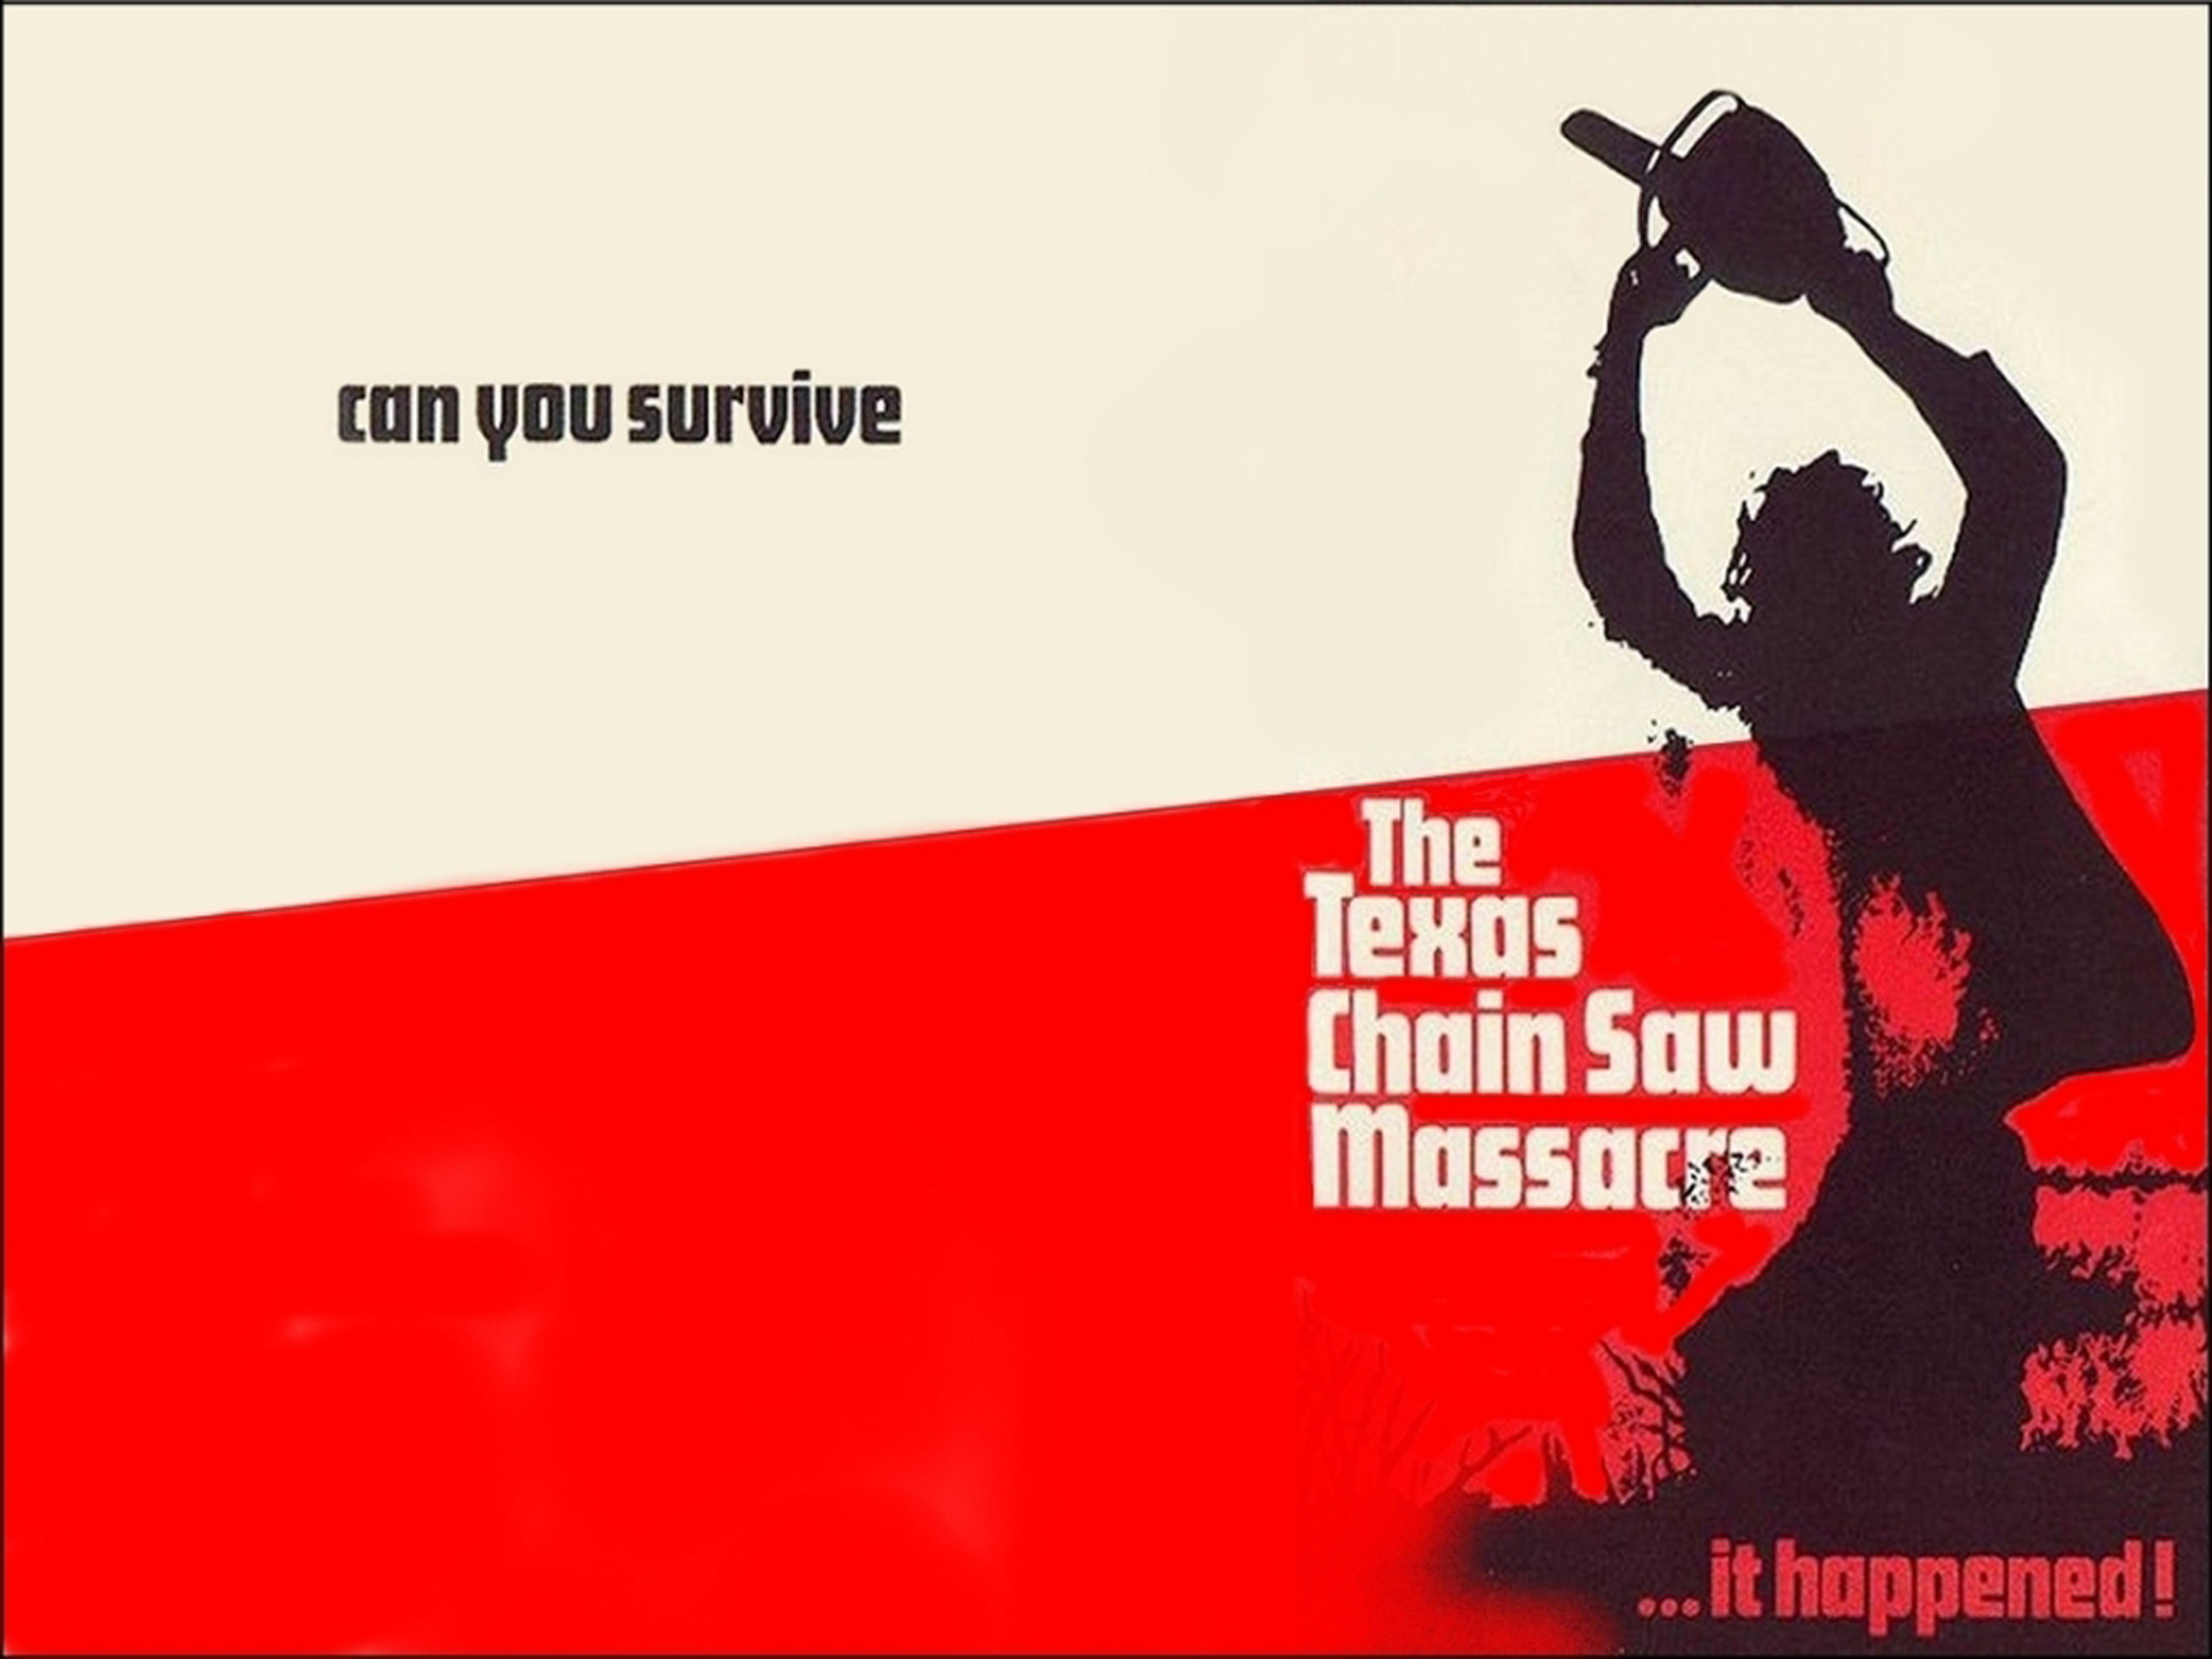 the-texas-chain-saw-massacre12